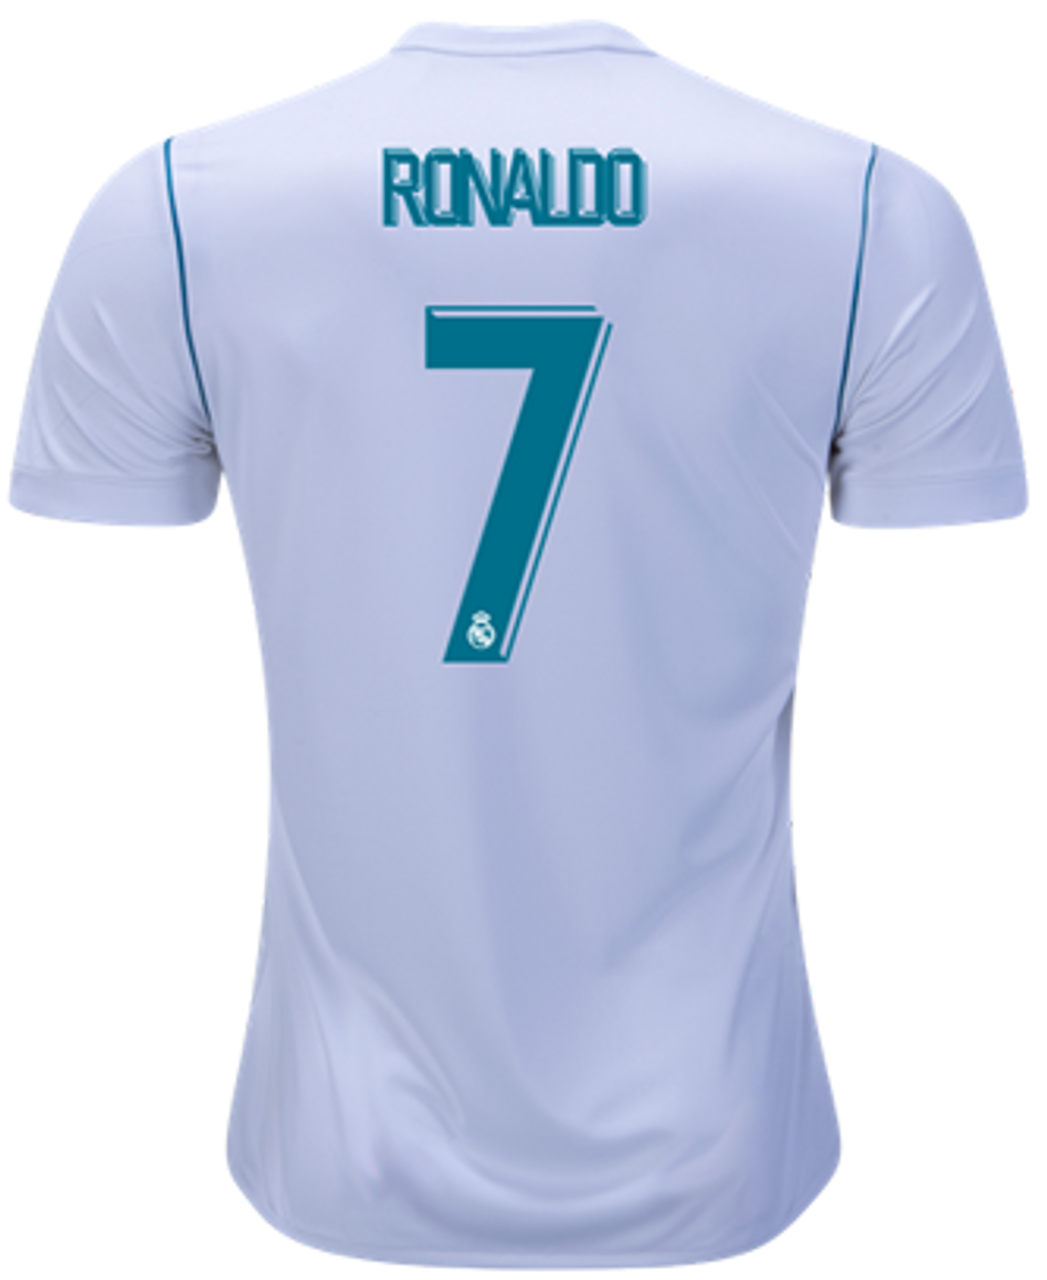 83001ad4e ADIDAS REAL MADRID 2018 RONALDO HOME JERSEY - Soccer Plus